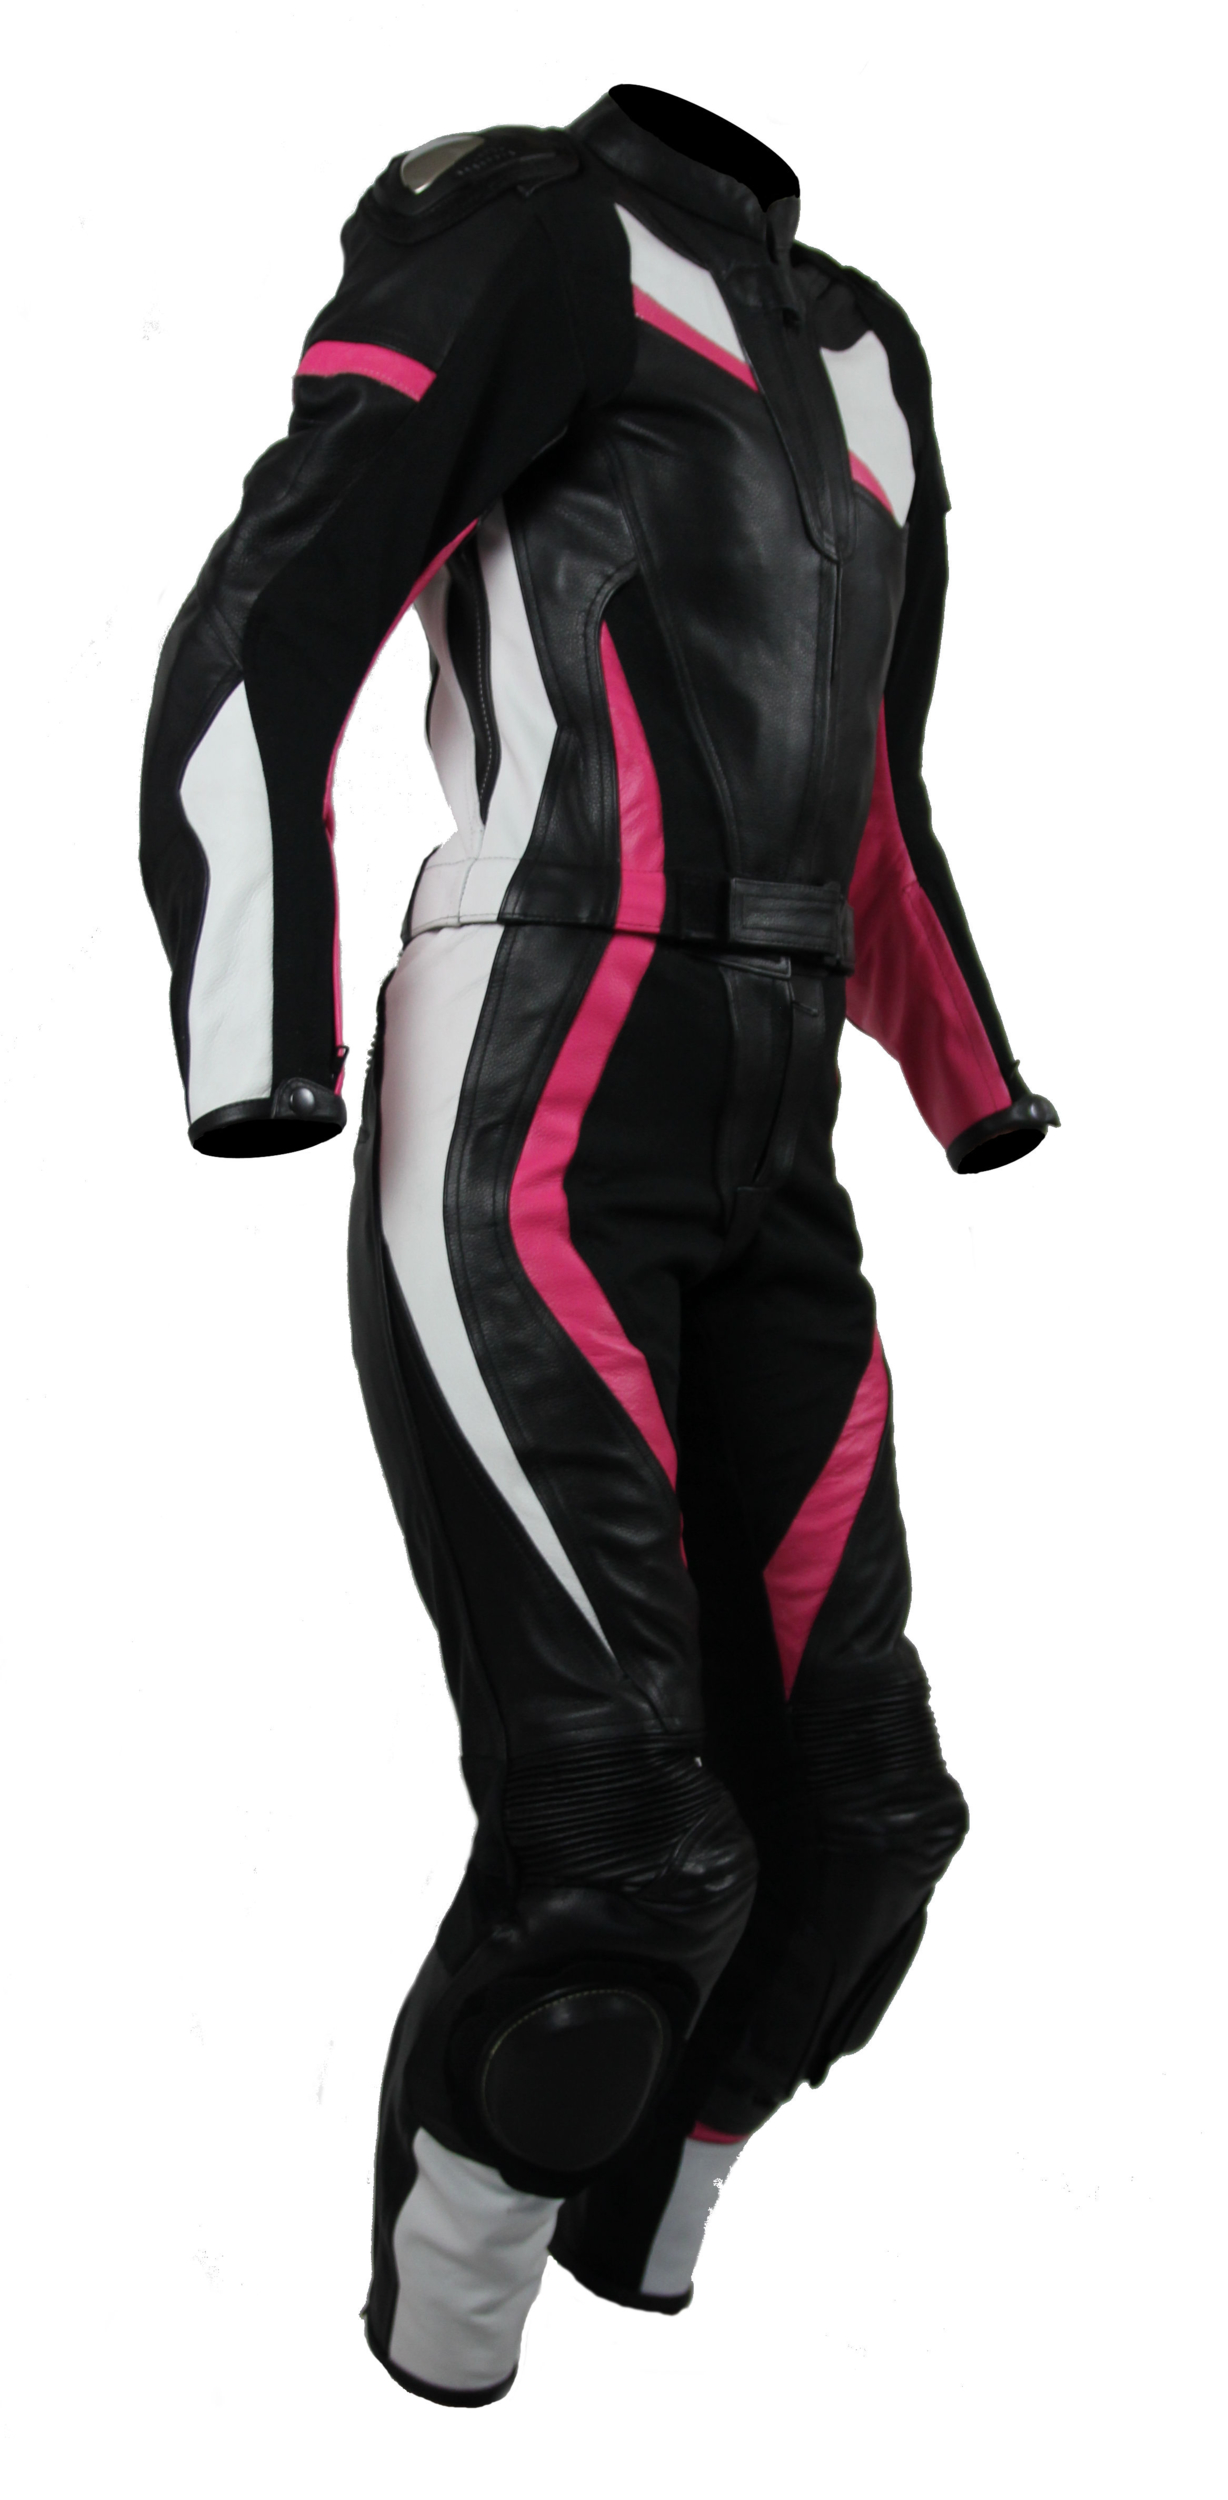 kc213 combinaison moto cuir femme lady gp karno 2 pi ces ebay. Black Bedroom Furniture Sets. Home Design Ideas